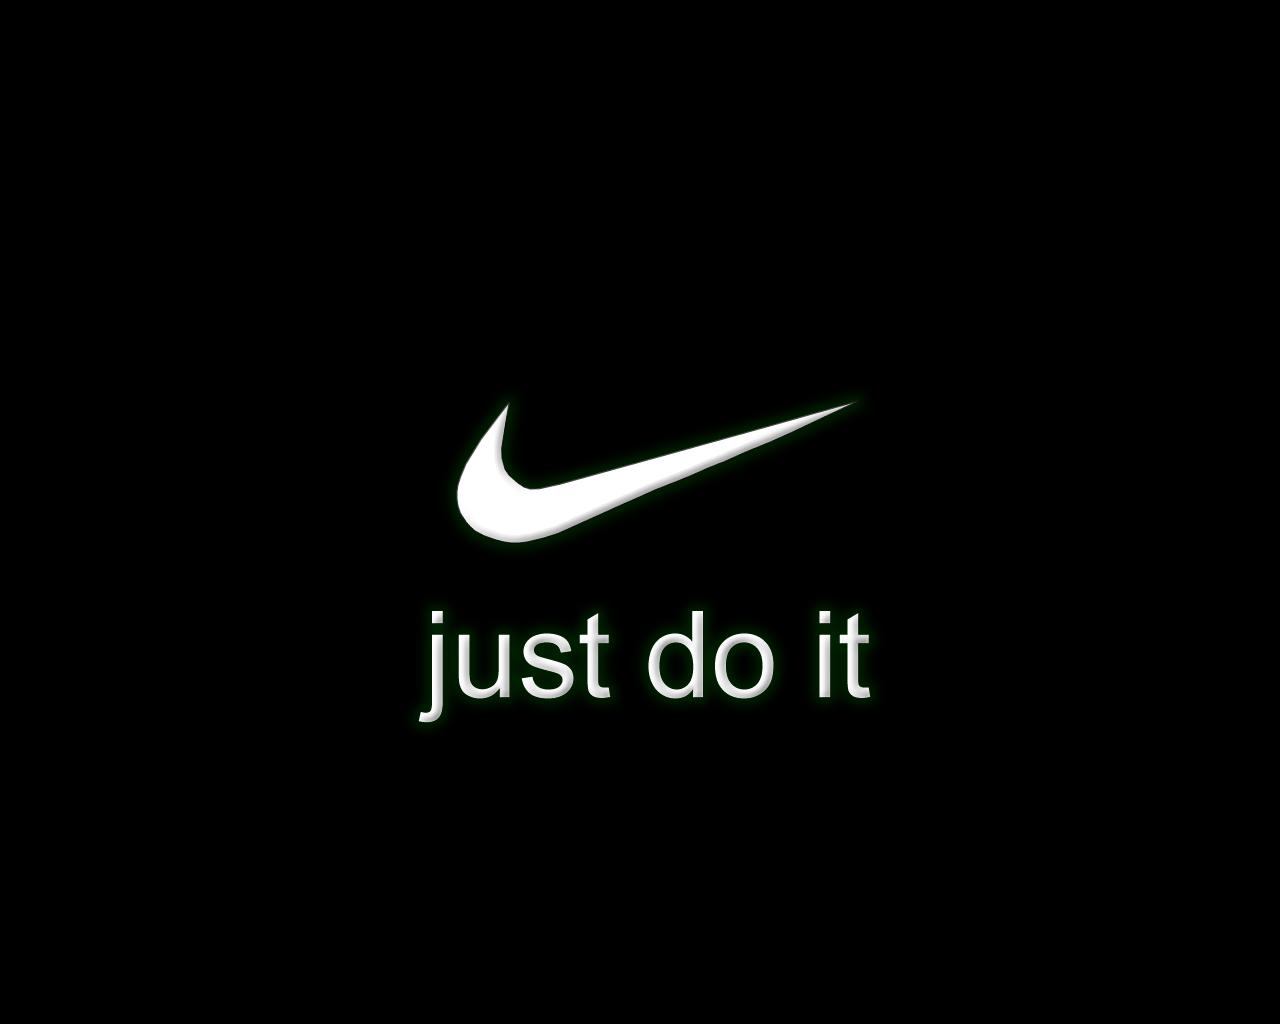 http://3.bp.blogspot.com/-le7zL8QwlKc/T-nIVUf9HRI/AAAAAAAAAJc/kQxsDCrs3R8/s1600/Nike_Swoosh_by_ozzierojas13.png